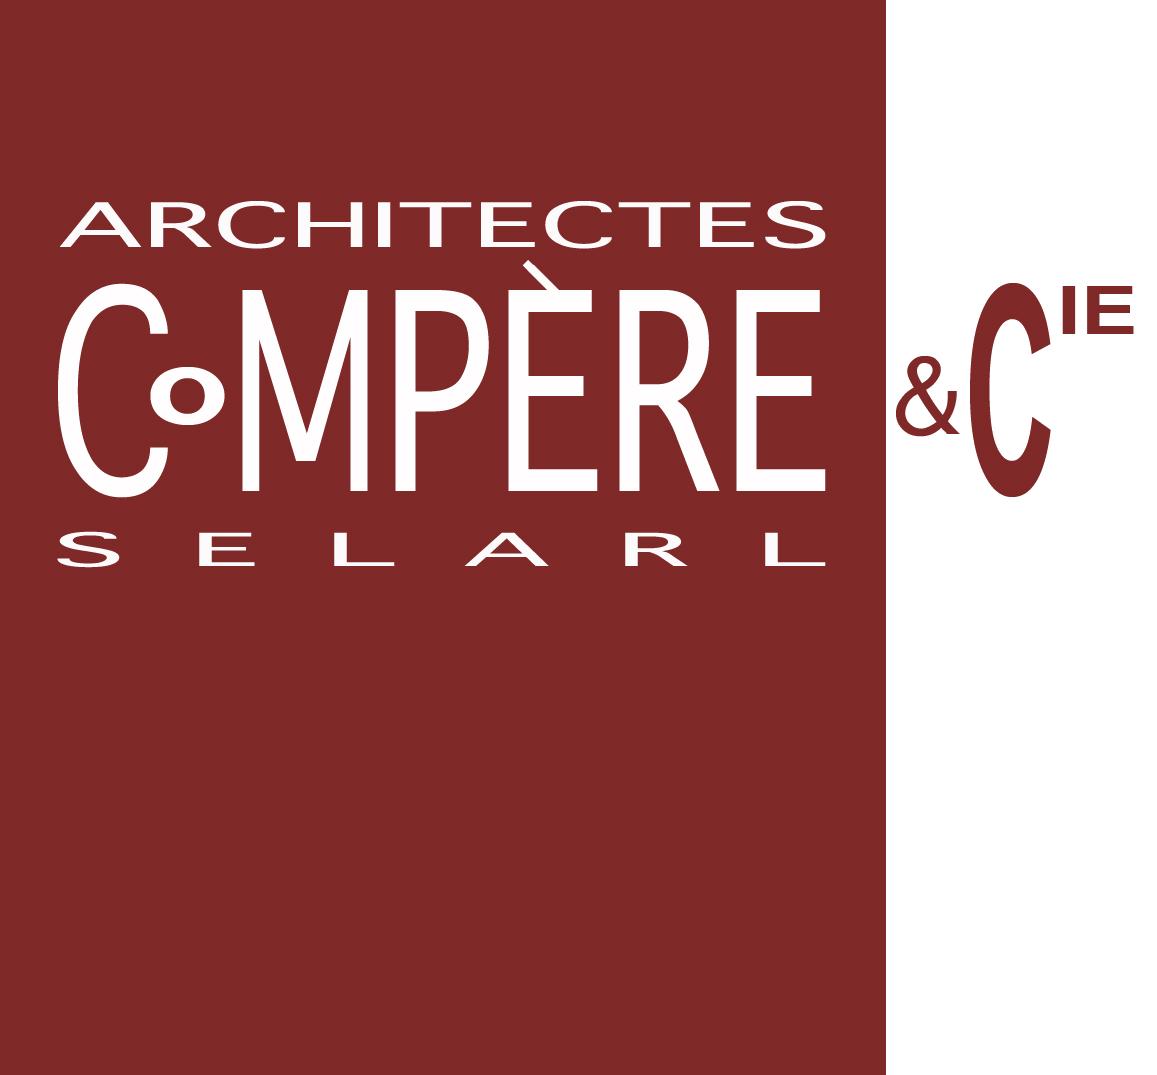 ARCHITECTES COMPERE & CIE